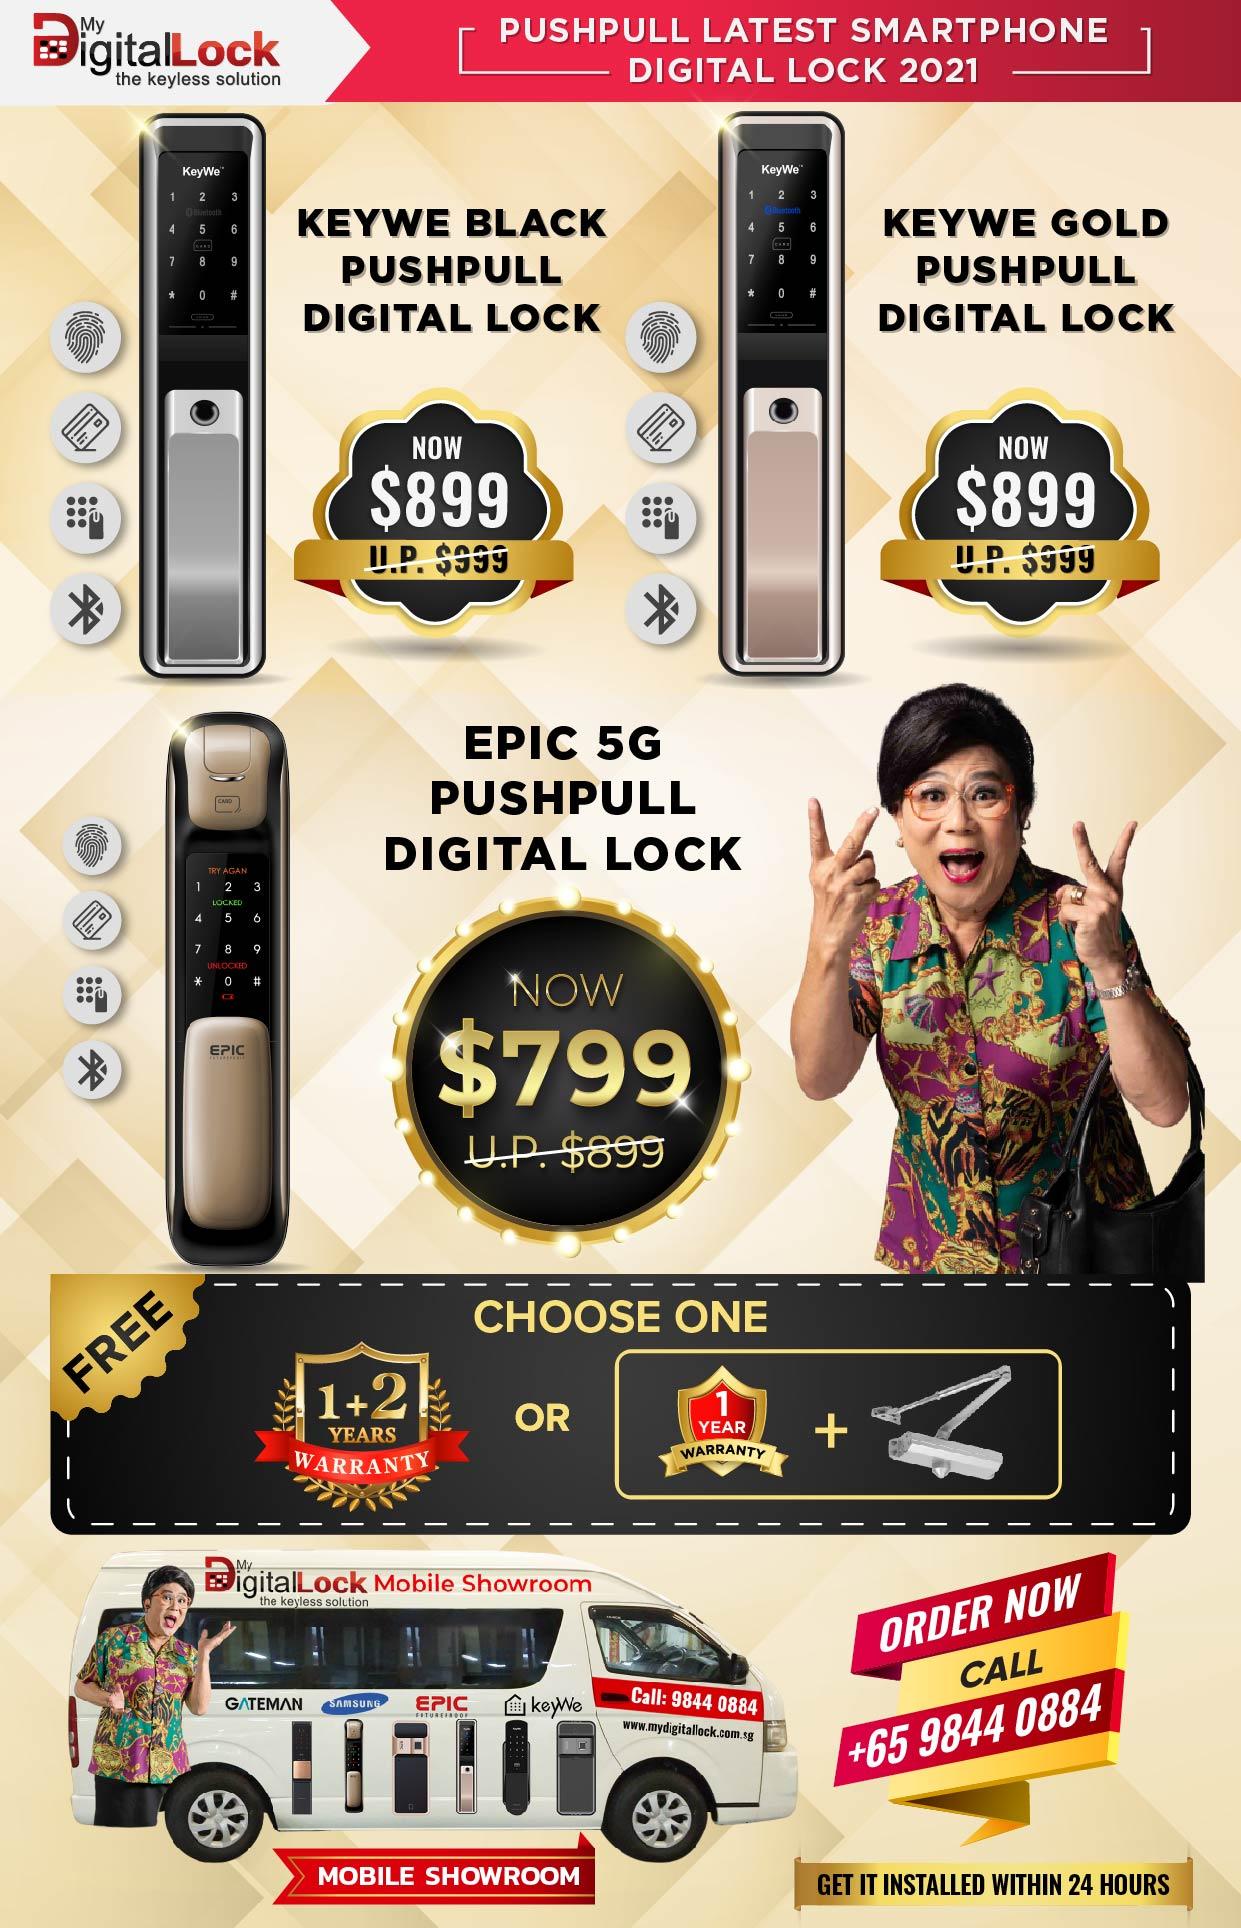 PushPull Latest Smartphone Digital Lock 2021